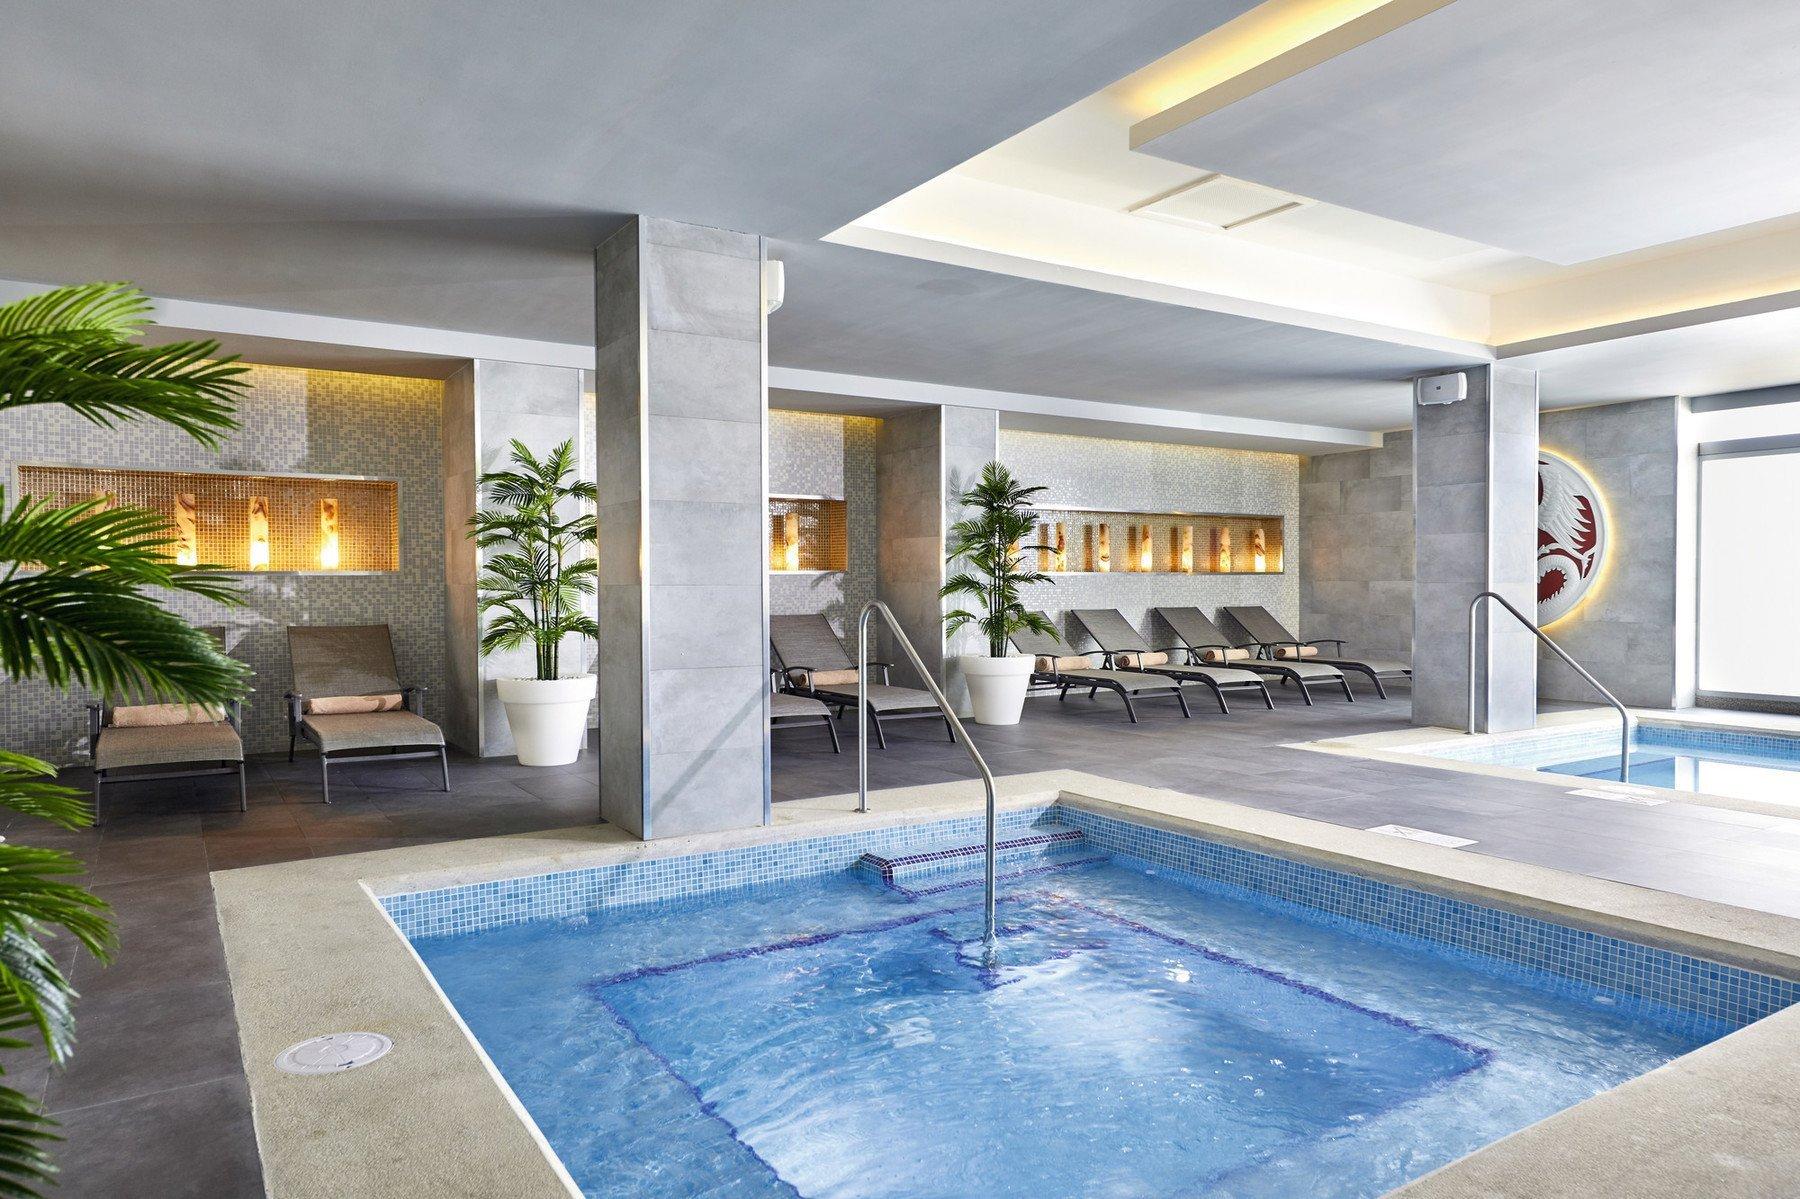 riu palace costa mujeres renova spa